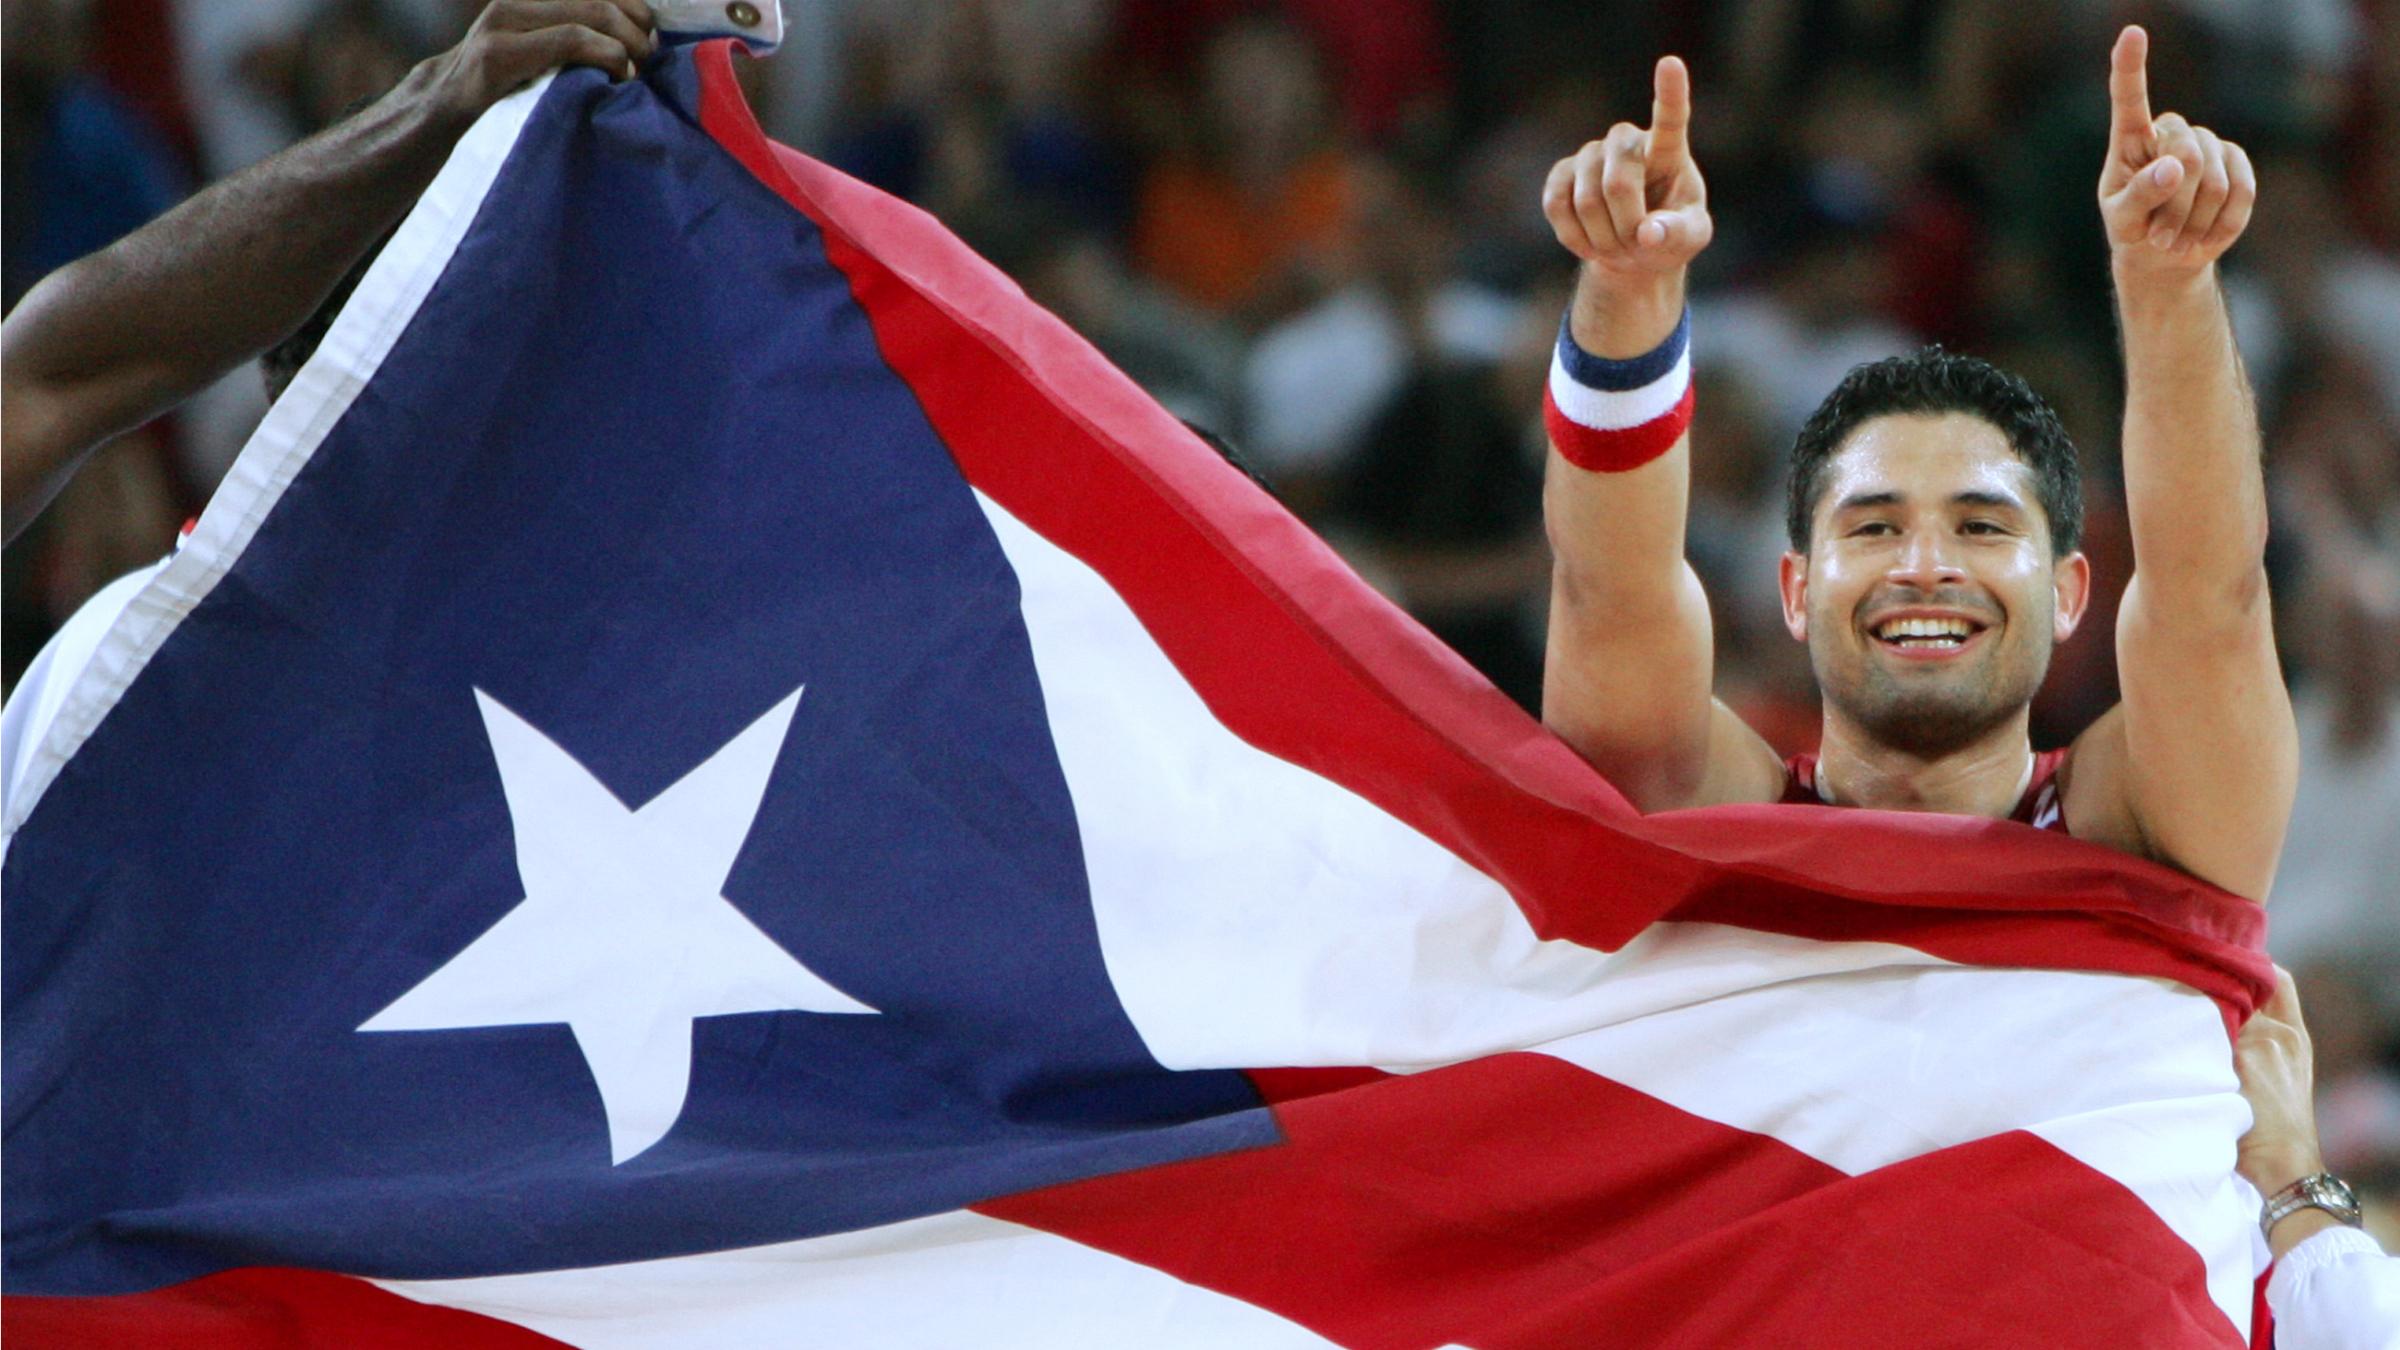 Puerto Rico flag